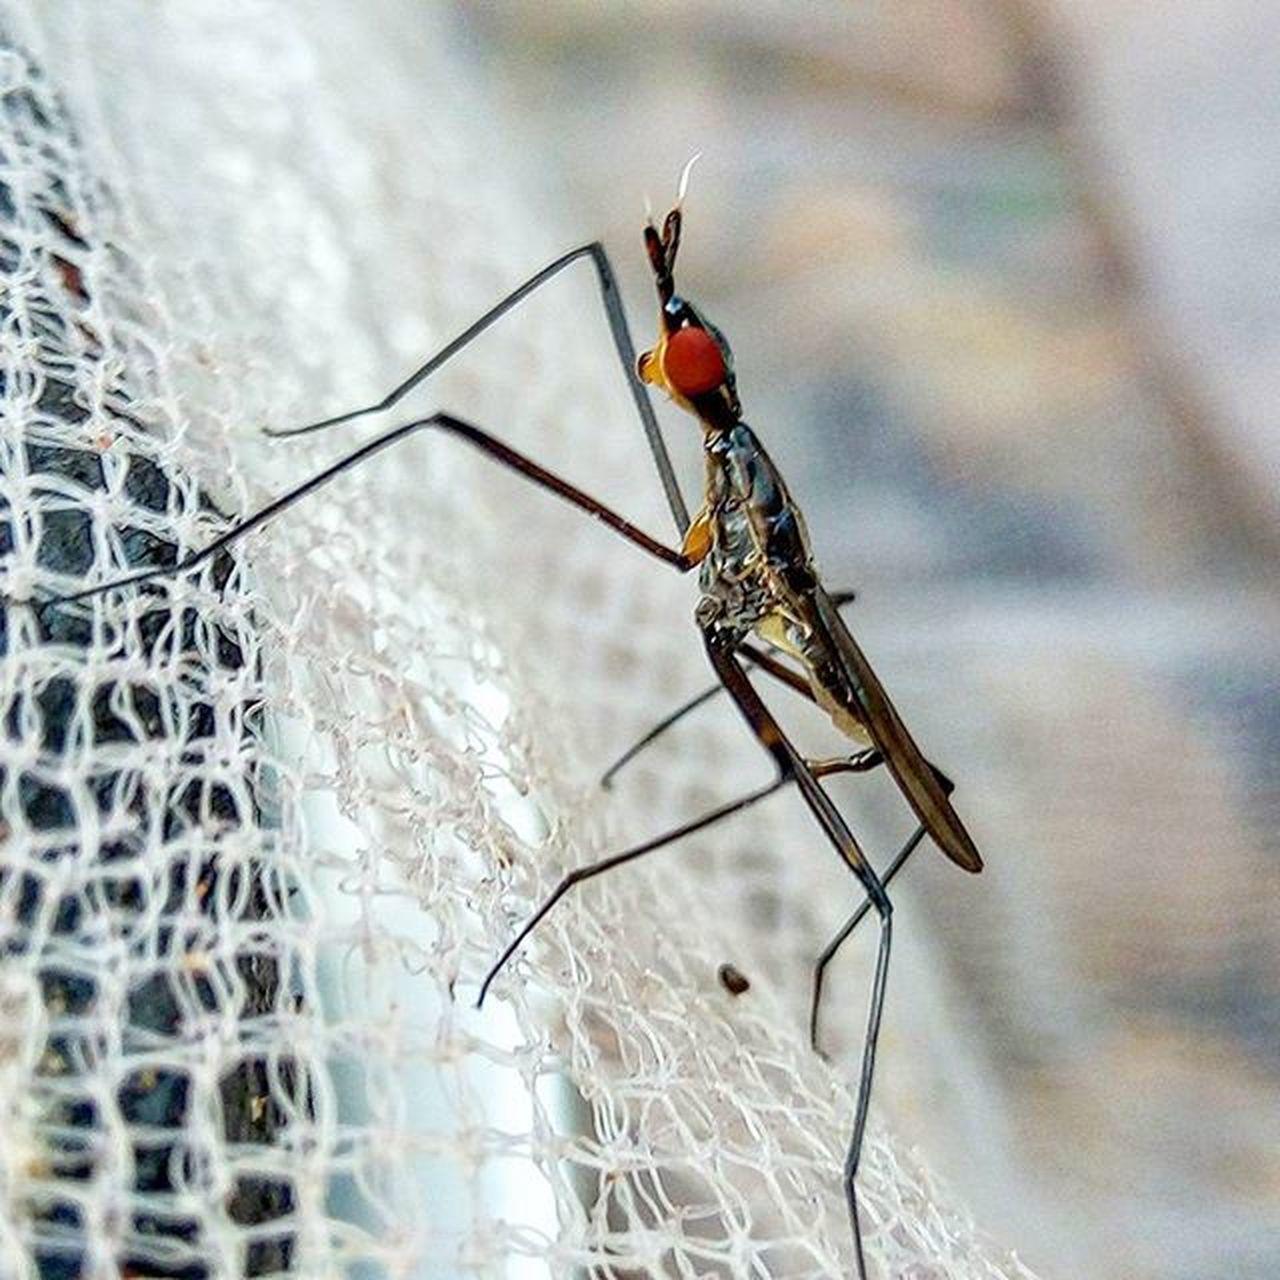 Nature Macro Photography Gioneeshutterbug Insect Bug Shotwithgionee Kerala Kottayam Nofilter Mobilephotography